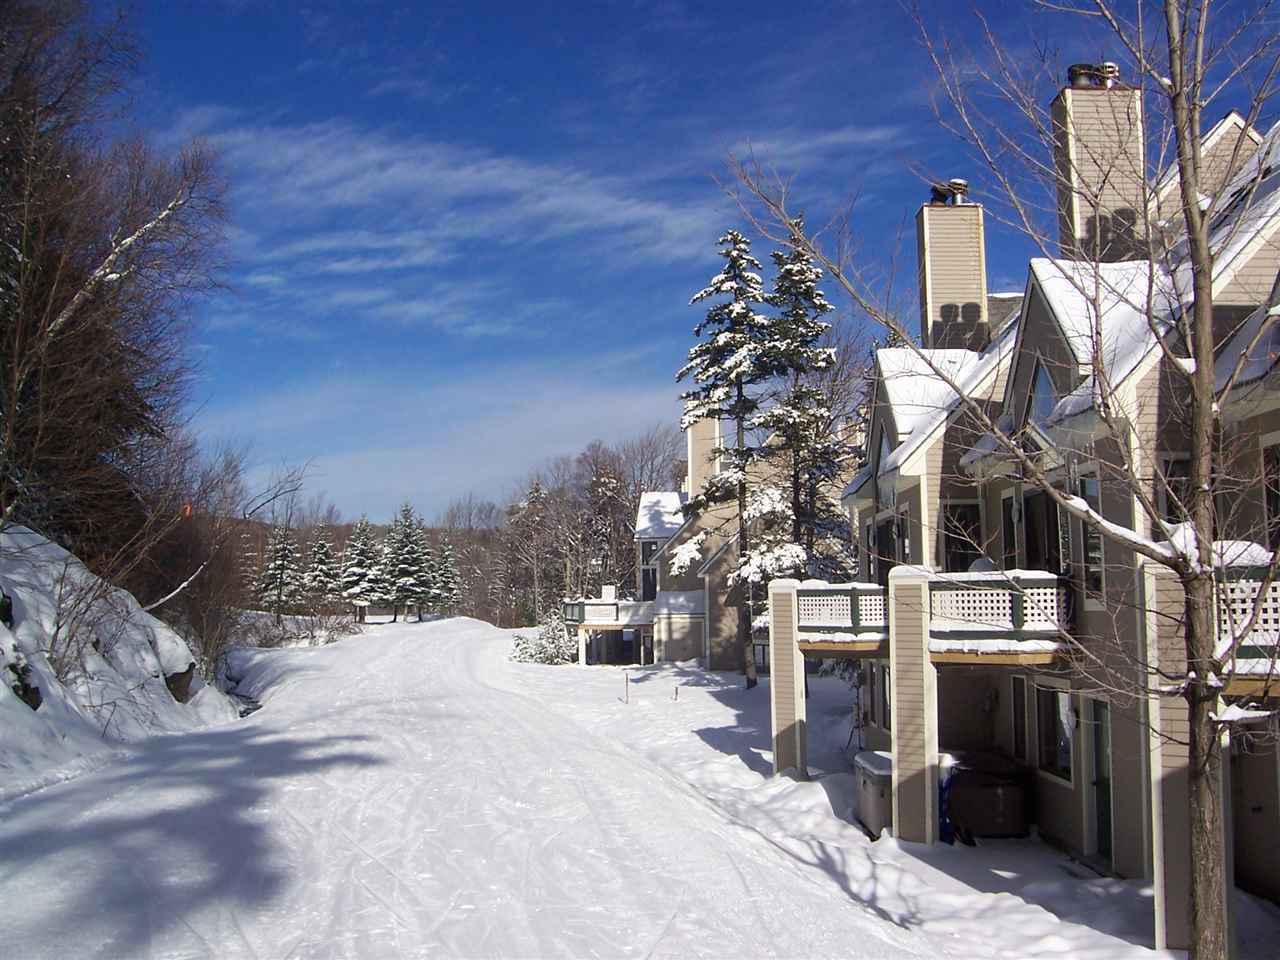 Mount-Snow-Real-Estate-4633728-15